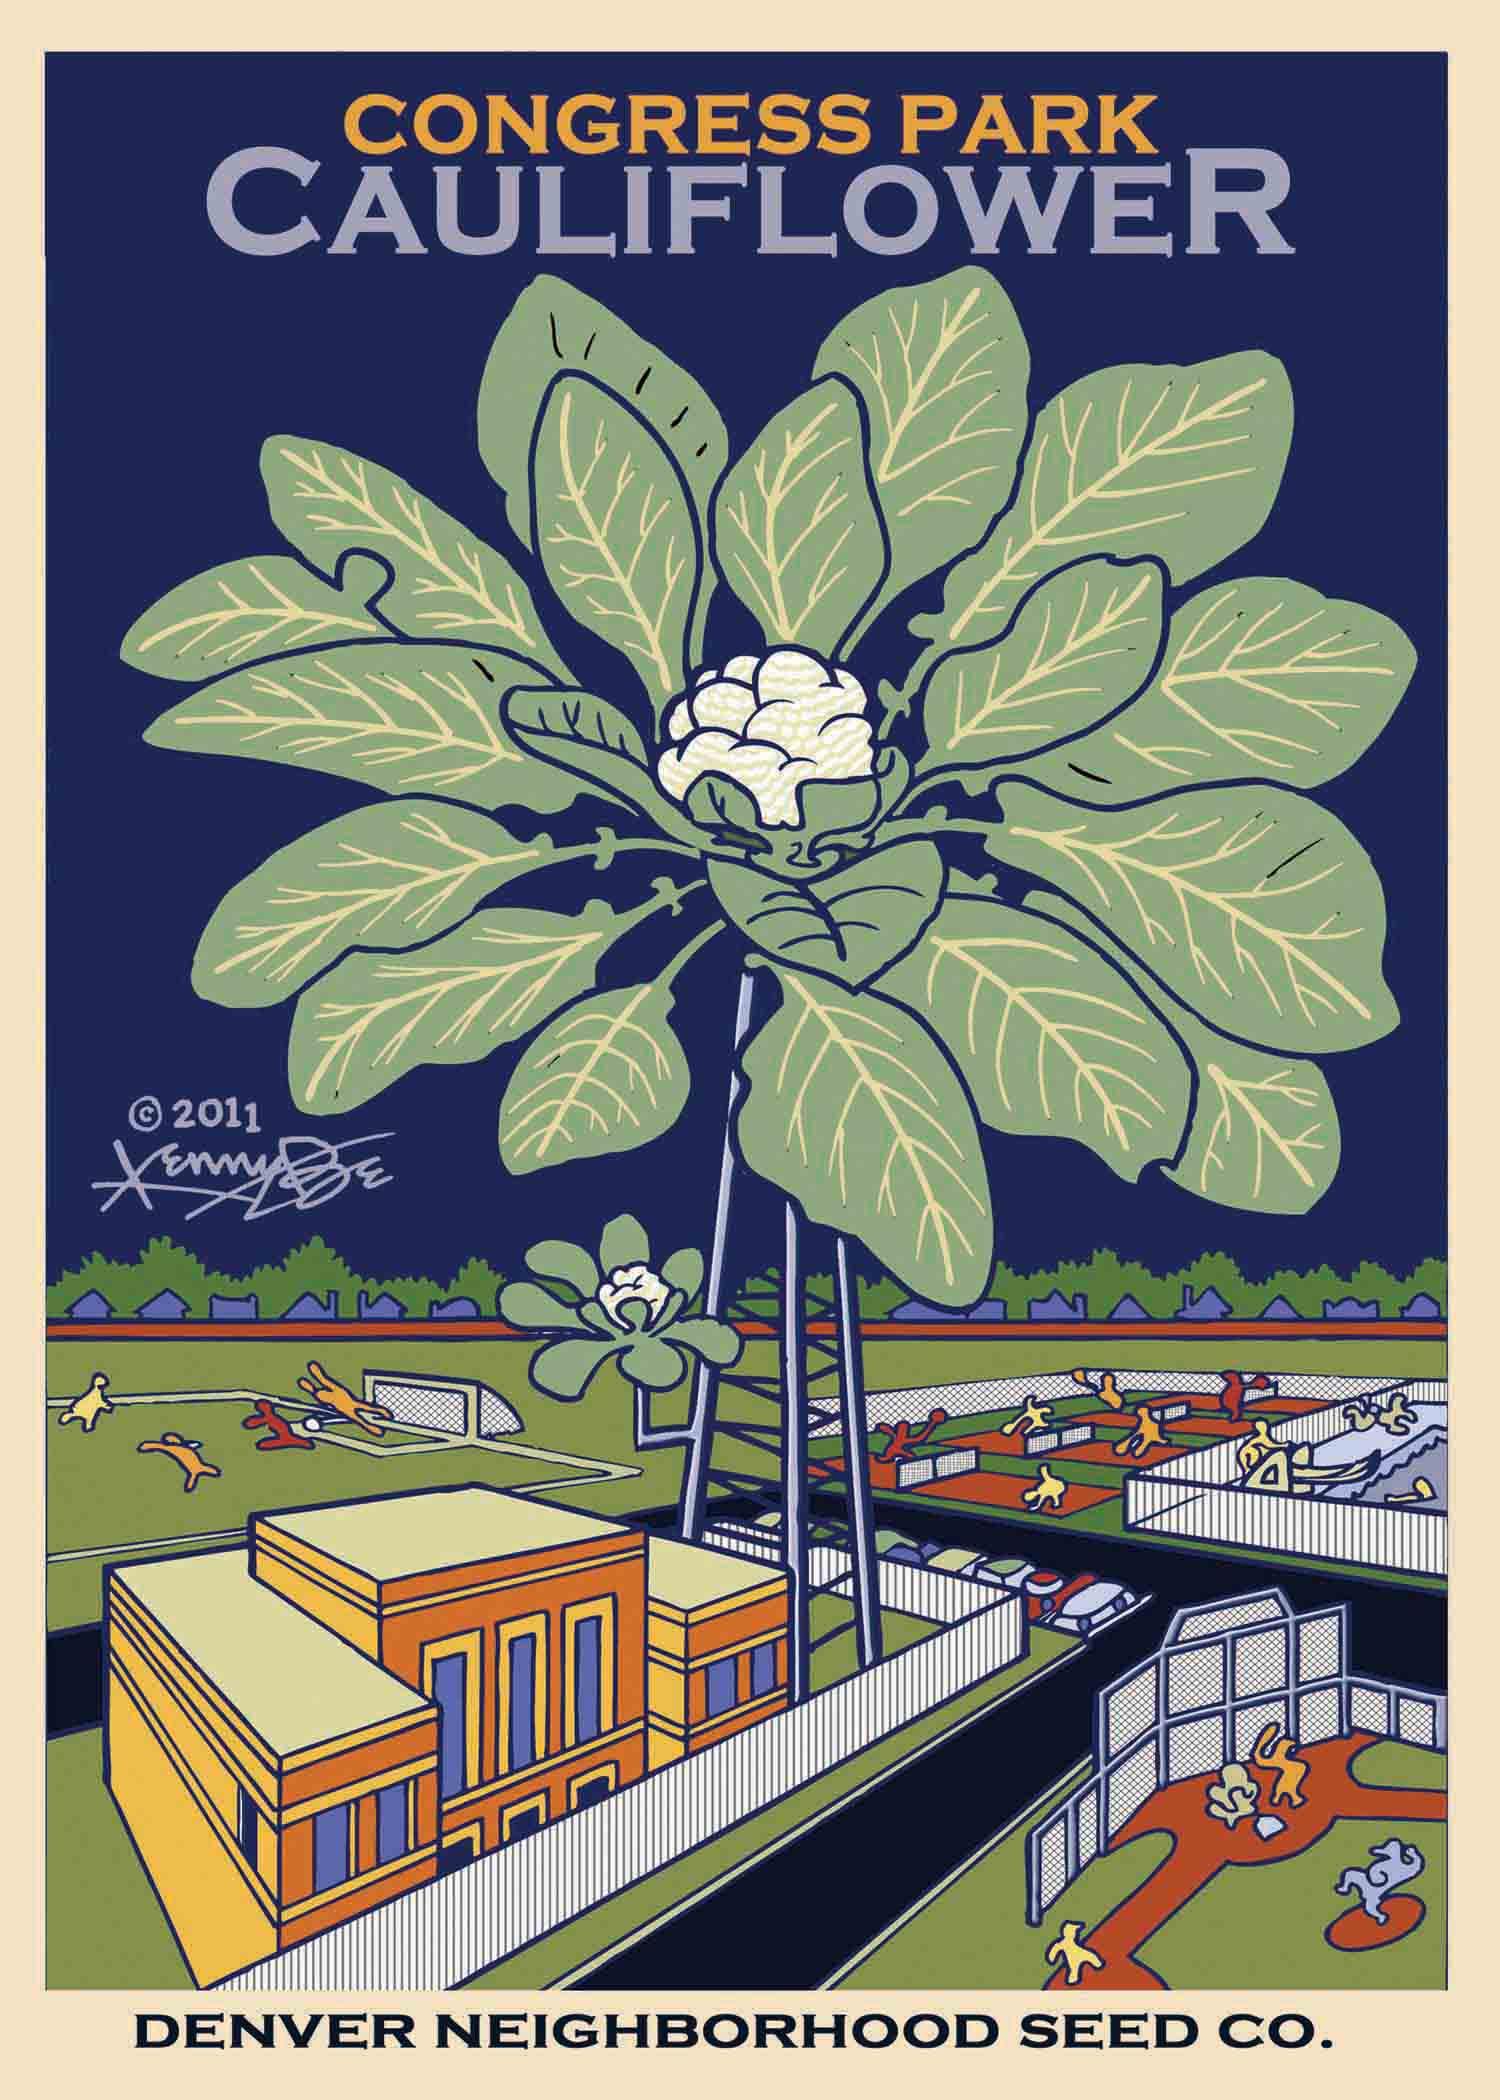 Congress+Park+Cauliflower+Denver+Neighborhood+Seed+Company+Kenny+Be+Art+&+Design